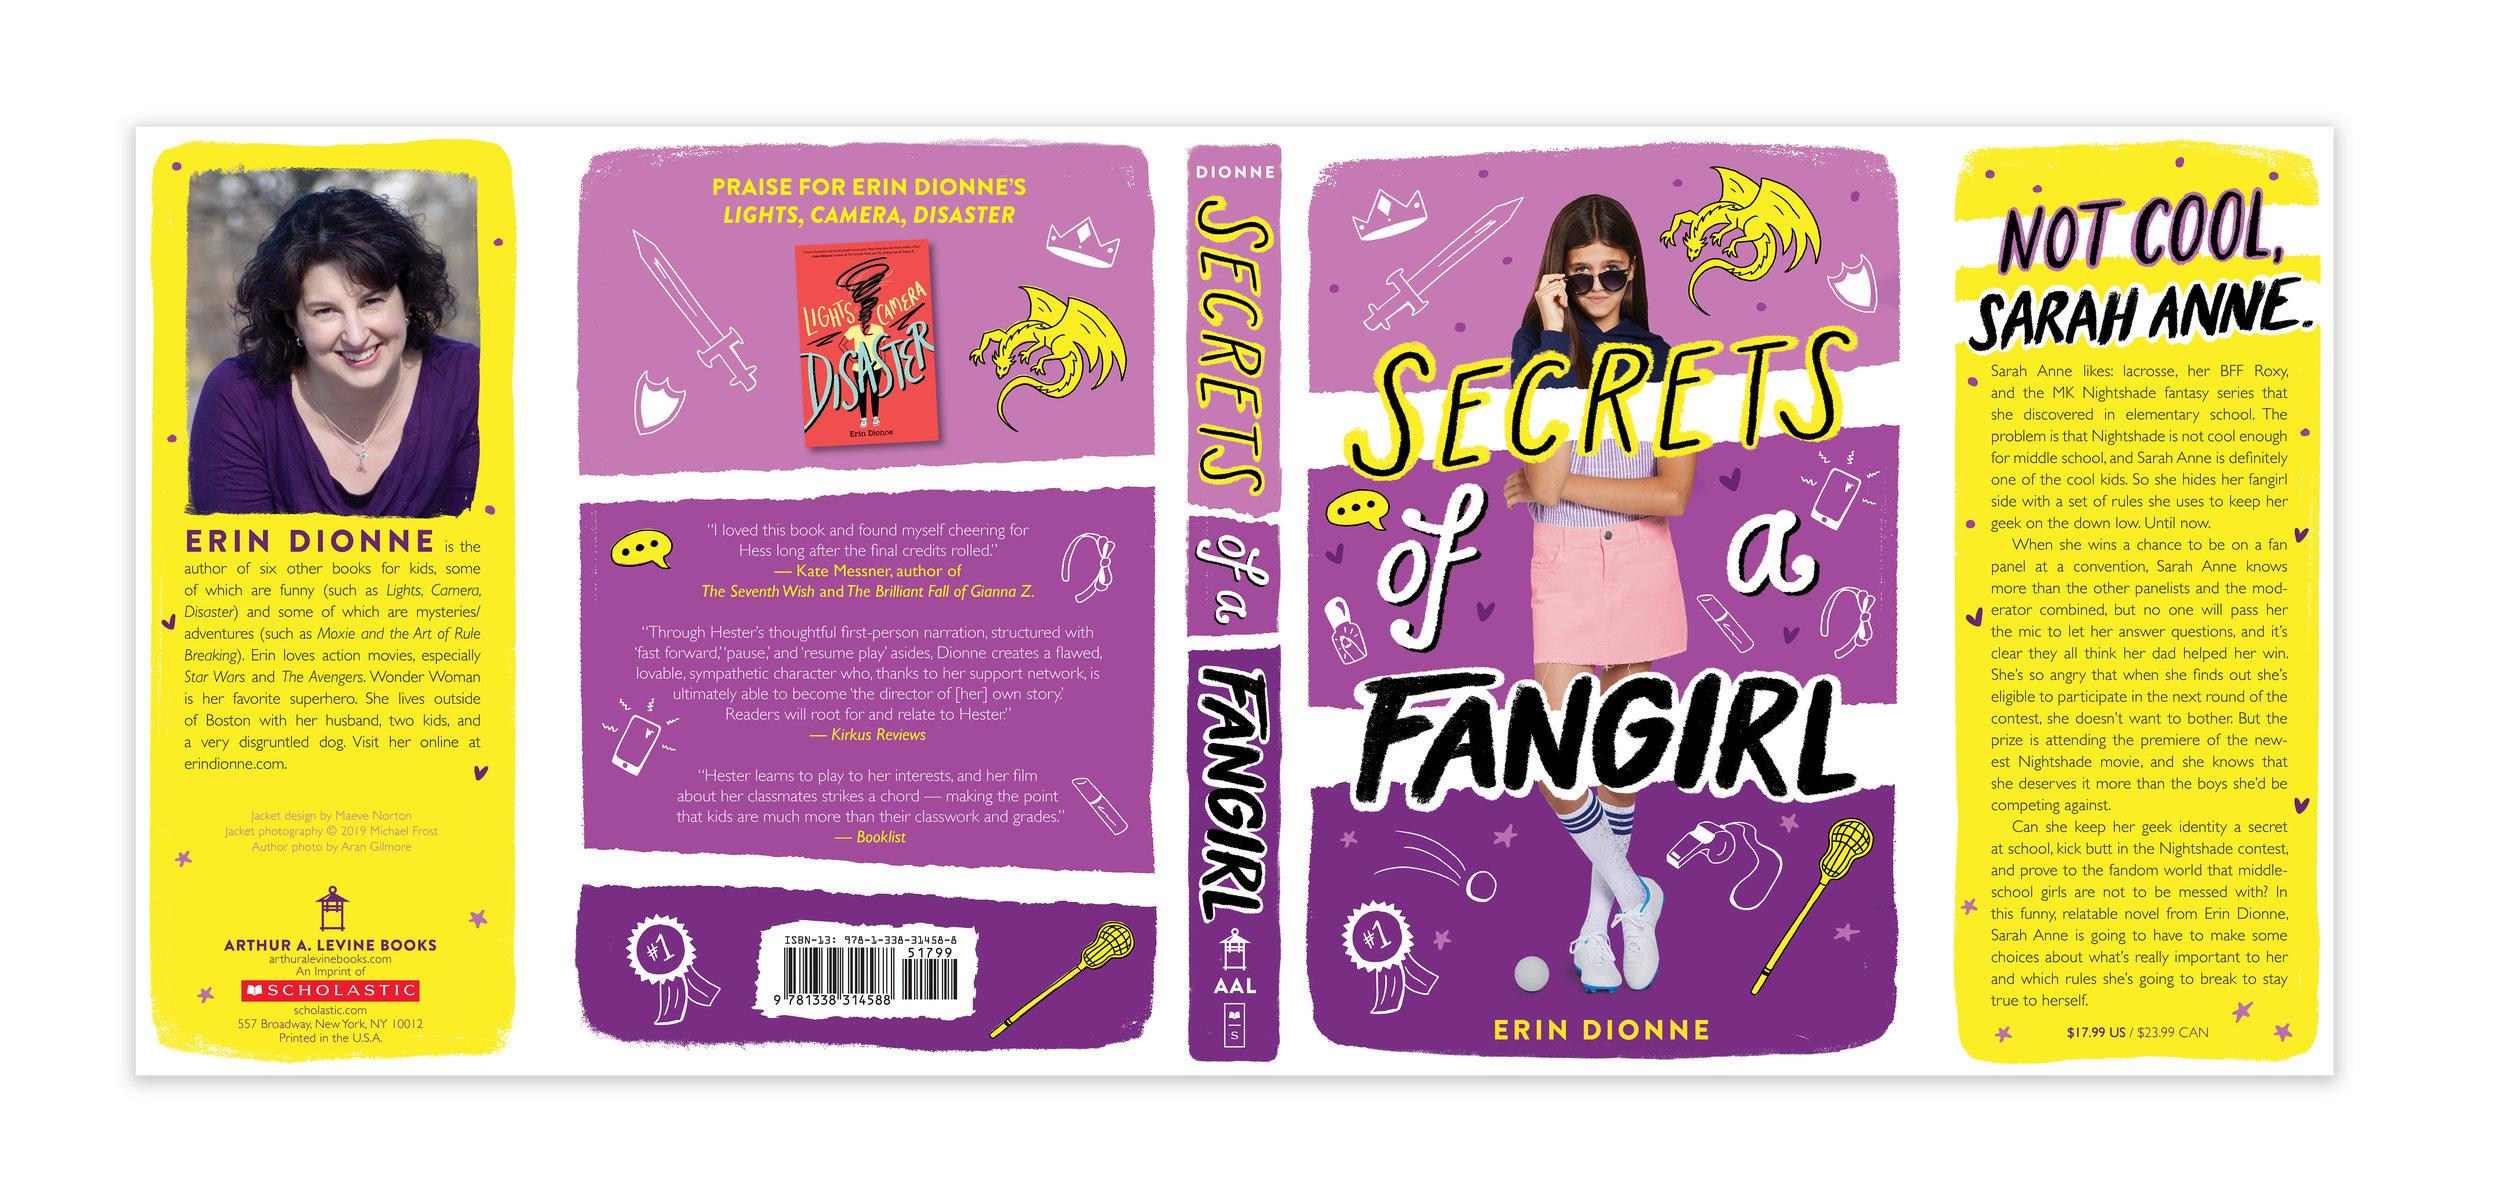 SecretsOfAFangirl_Jacket.jpg